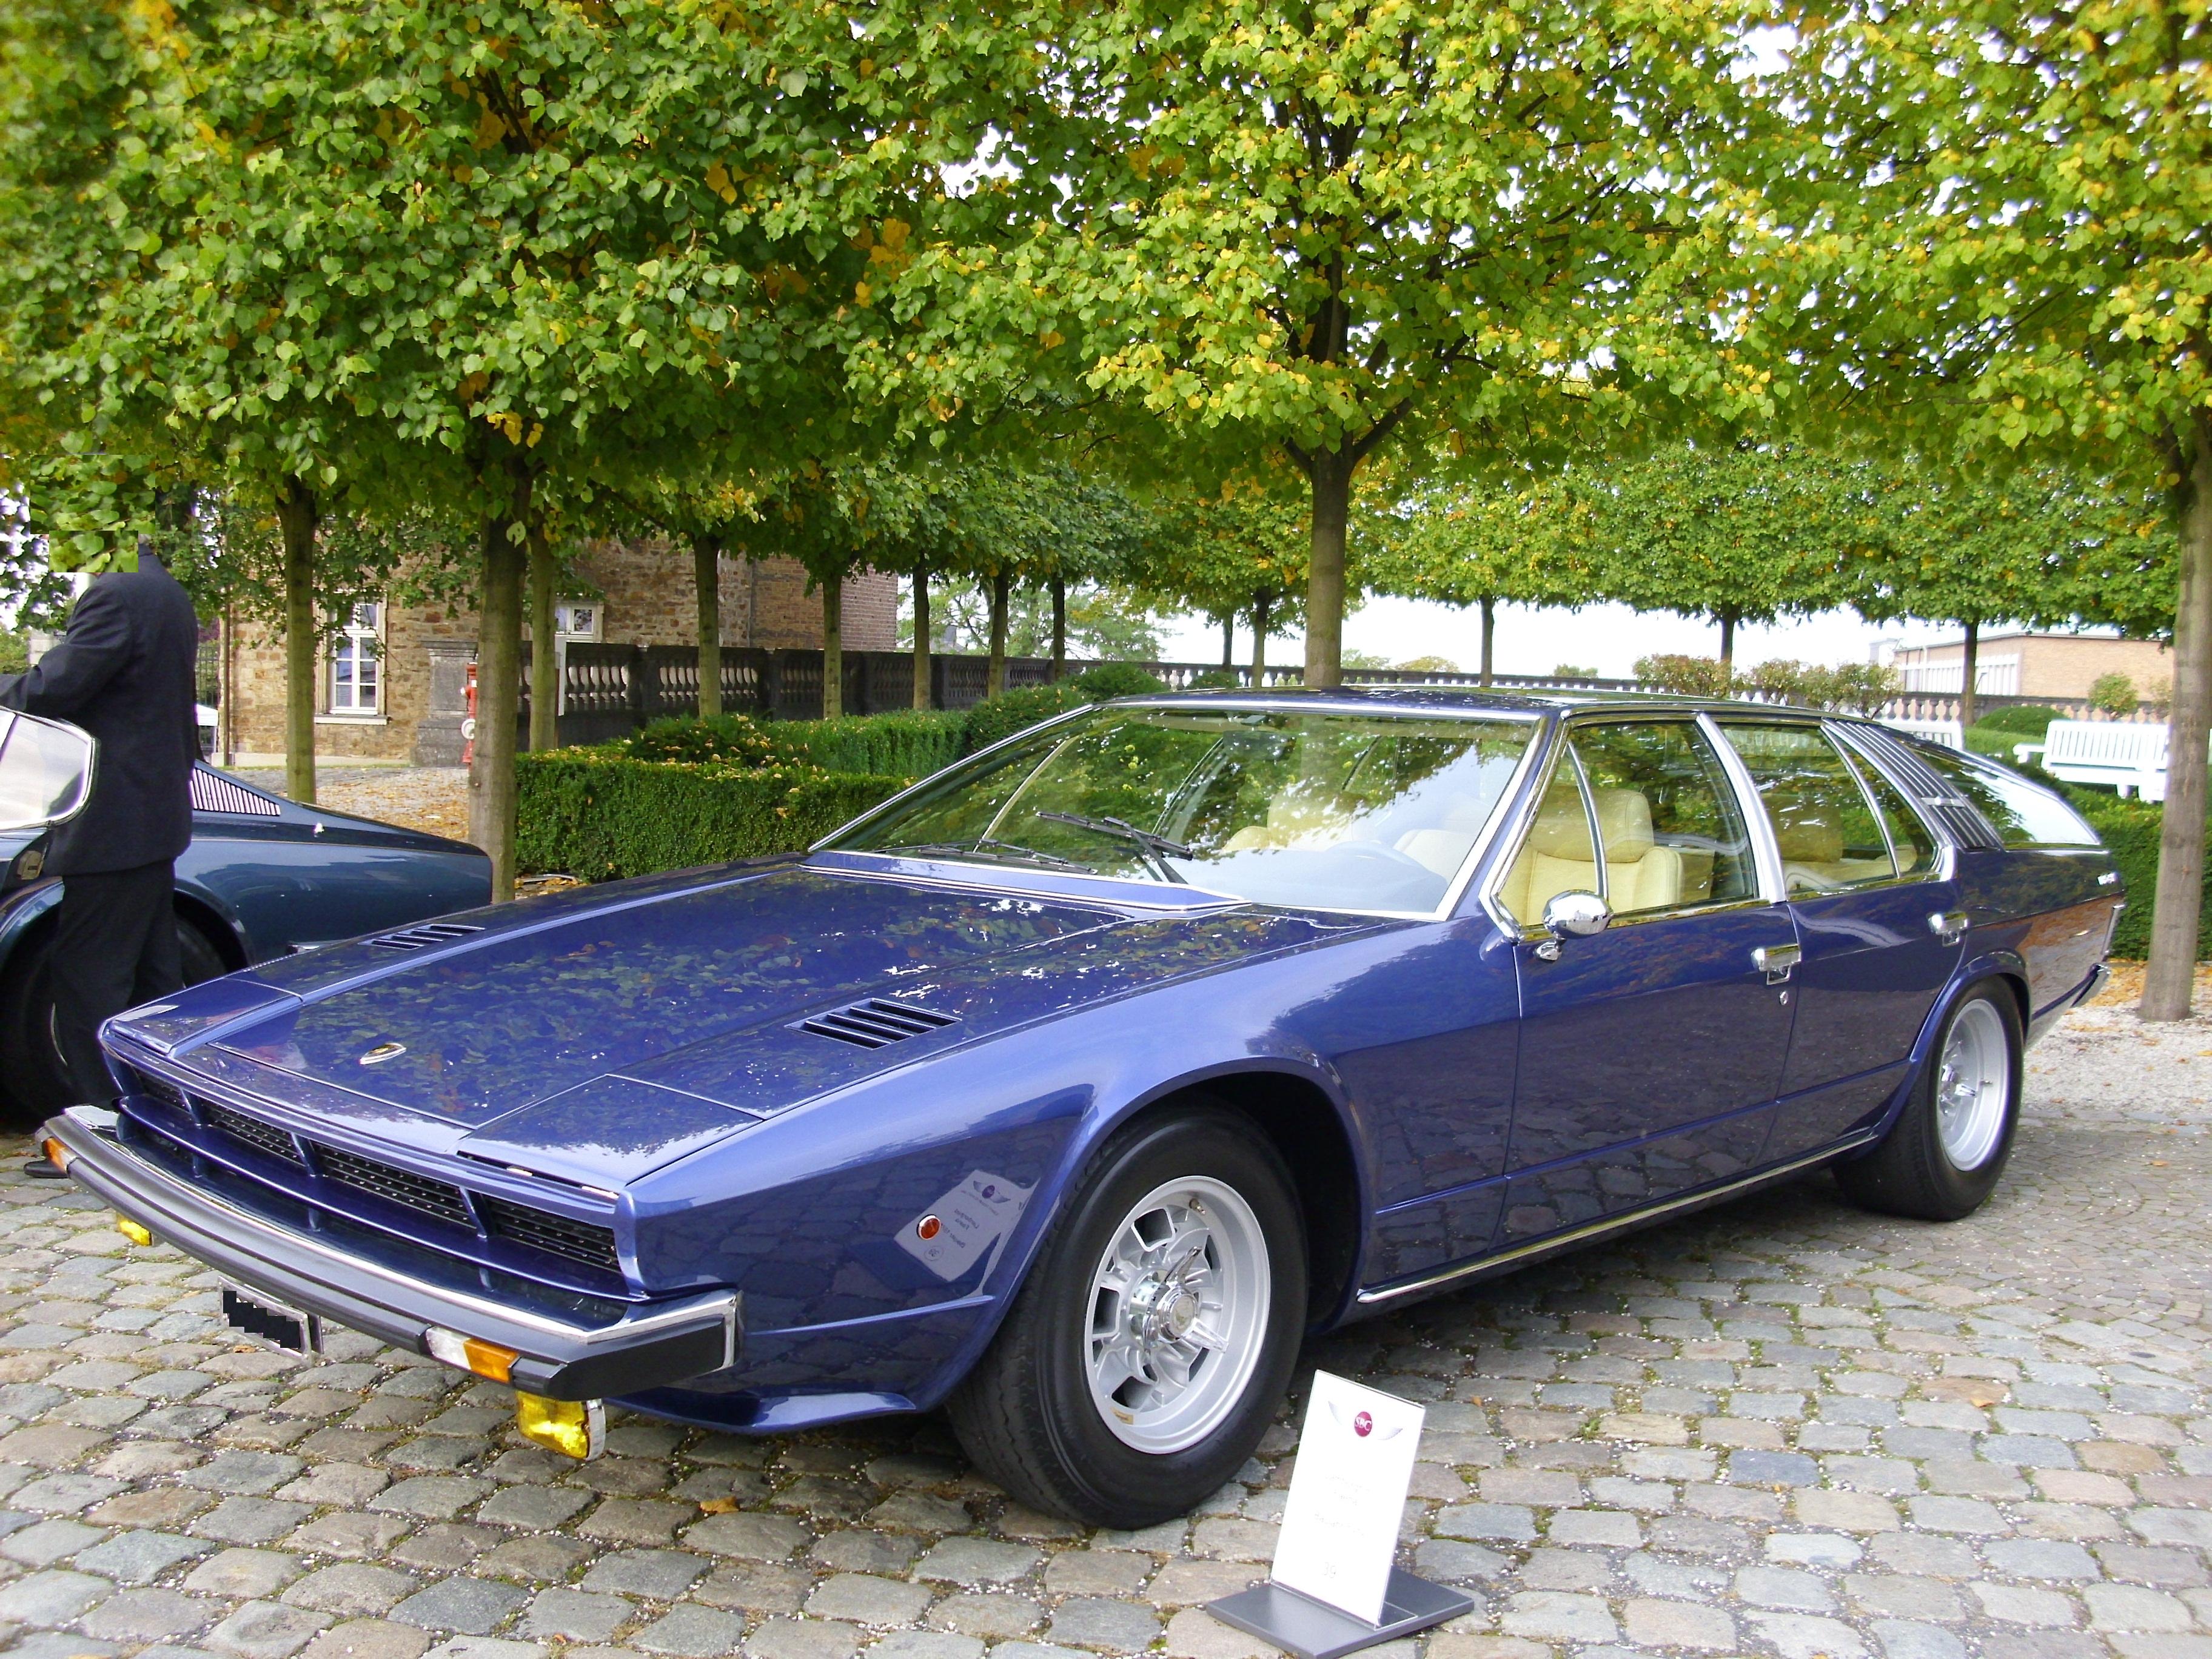 Lamborghini_Faena_1978_schr%C3%A4g.JPG